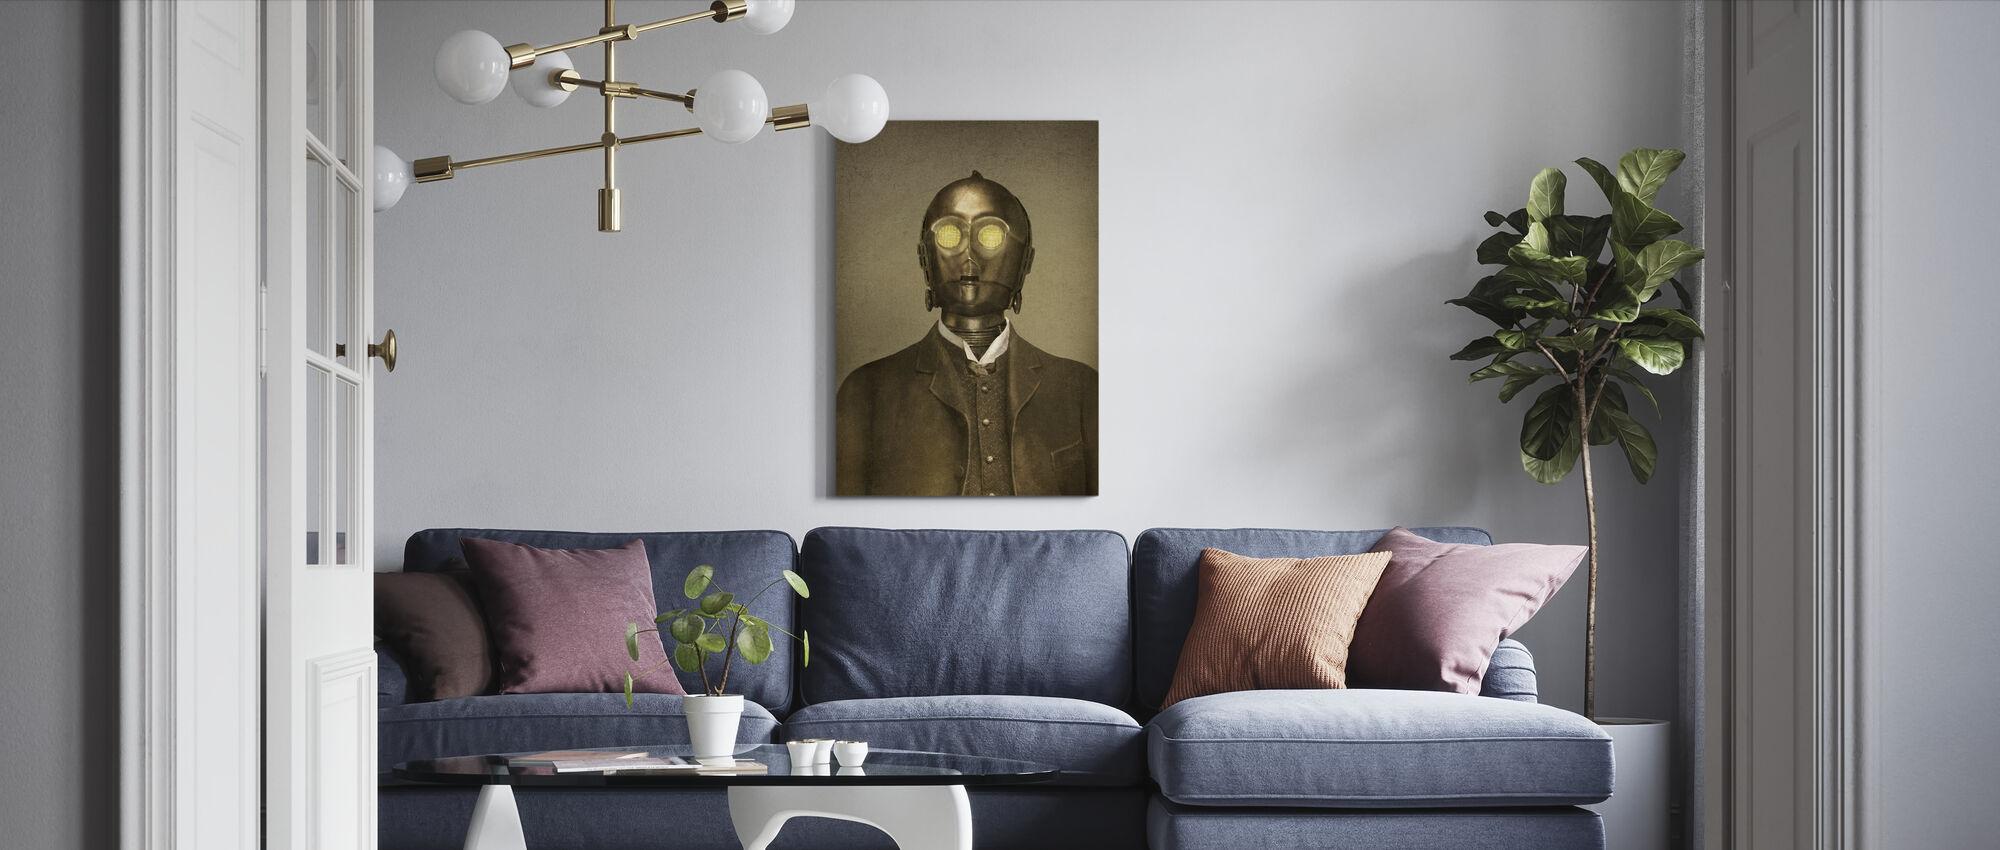 Victorian Wars Baron Von 3PO - Canvas print - Living Room